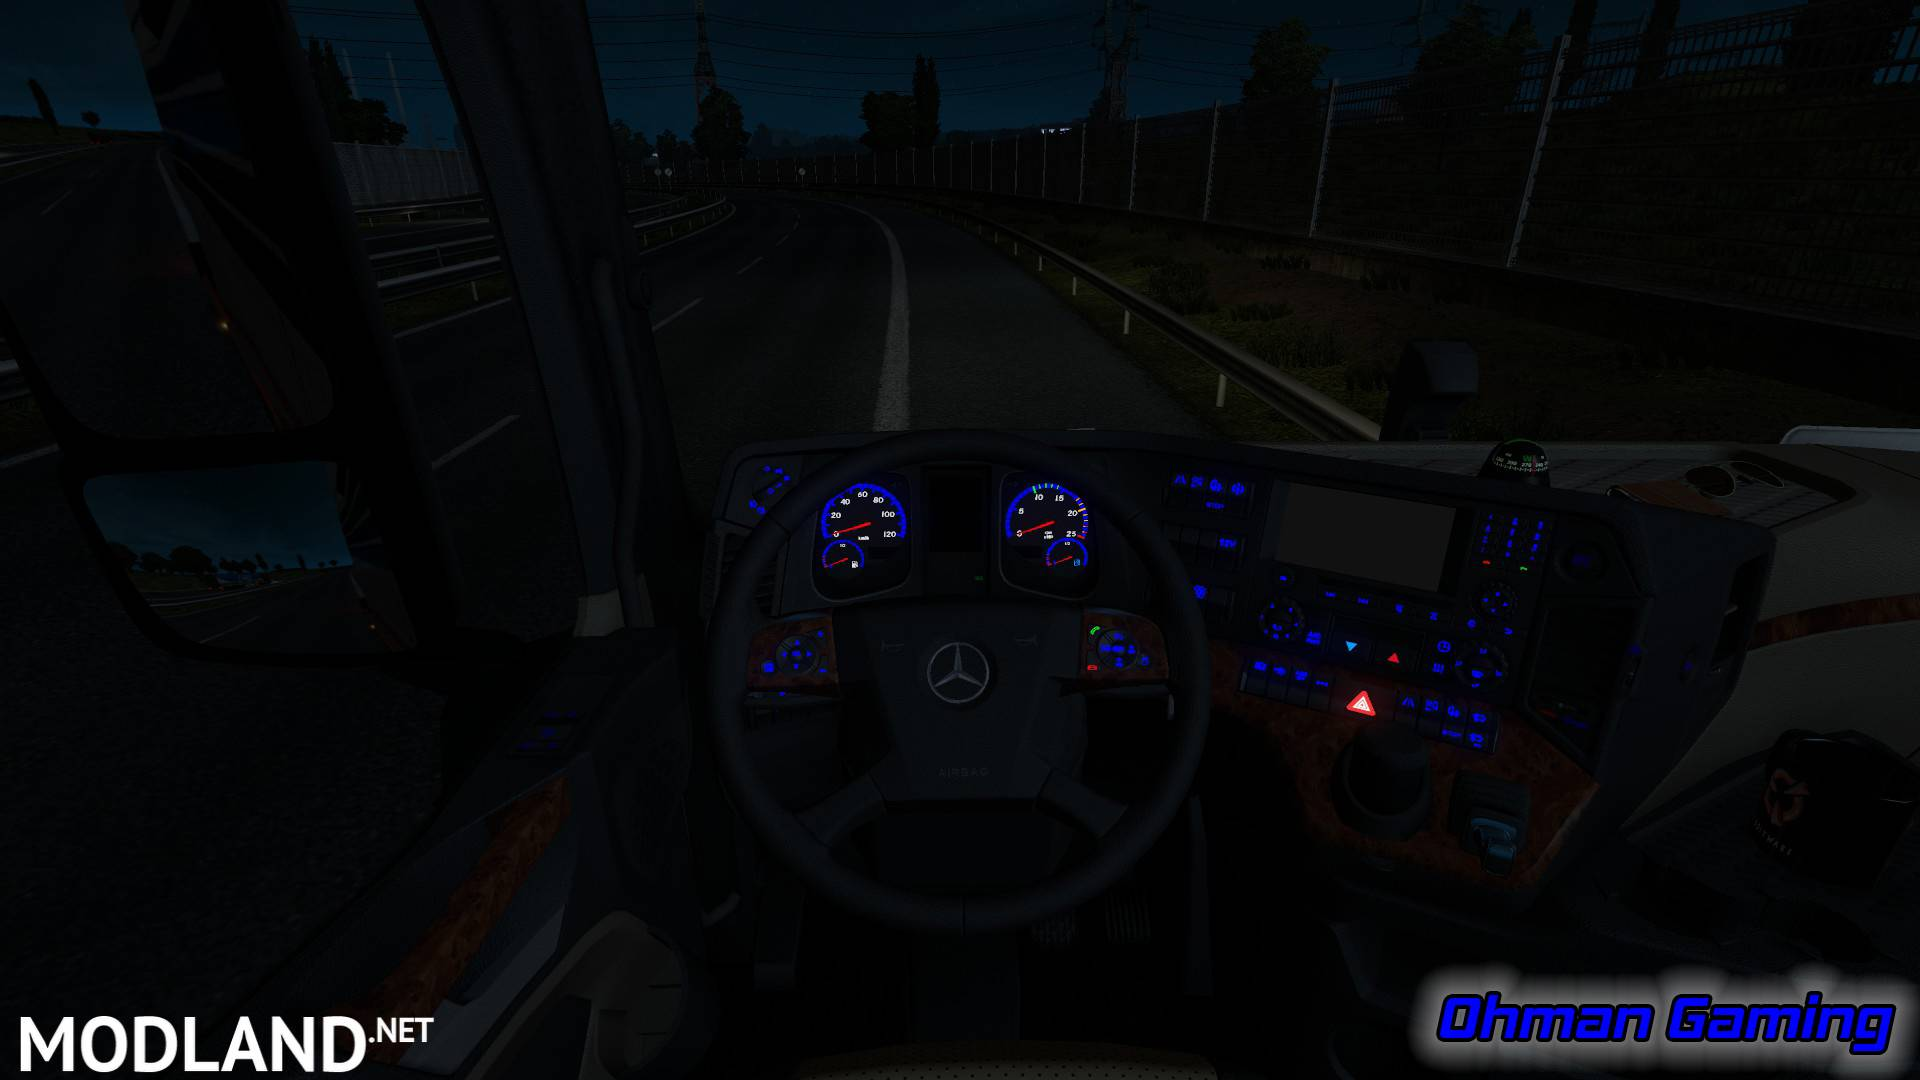 Mercedes benz mp4 blue dashboard lights mod for ets 2 for Mercedes benz indicator lights